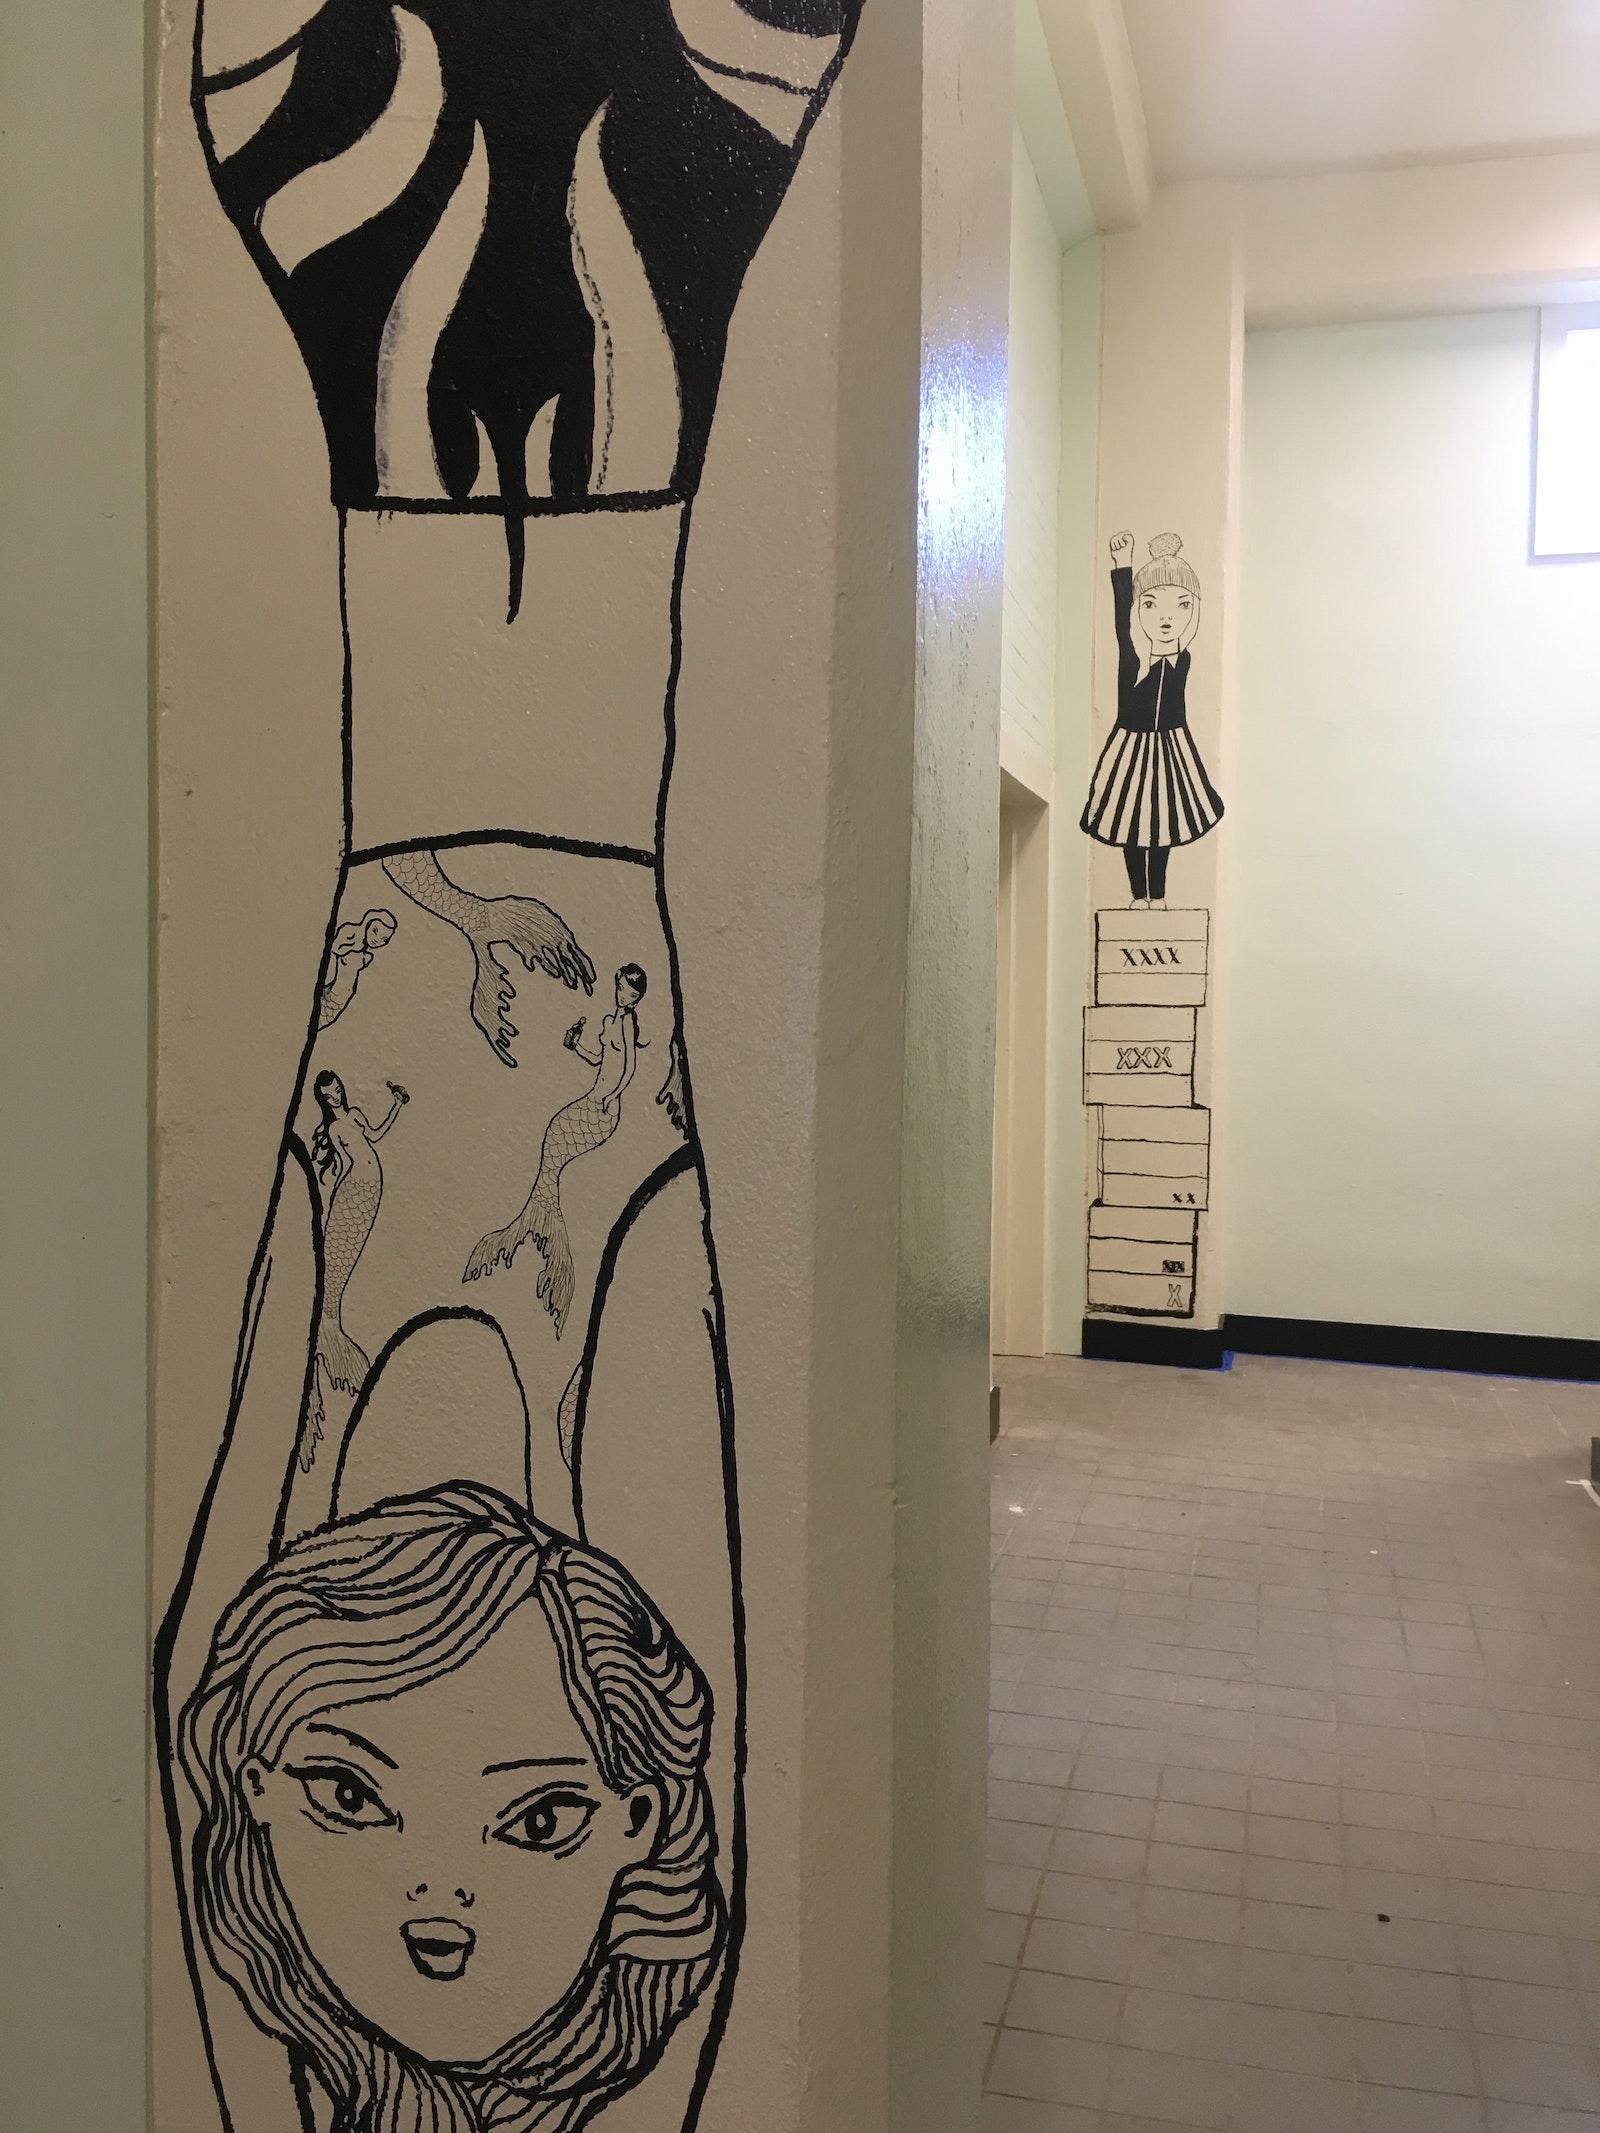 Bespoke murals at Degrees Palto by Anne Bundgaard